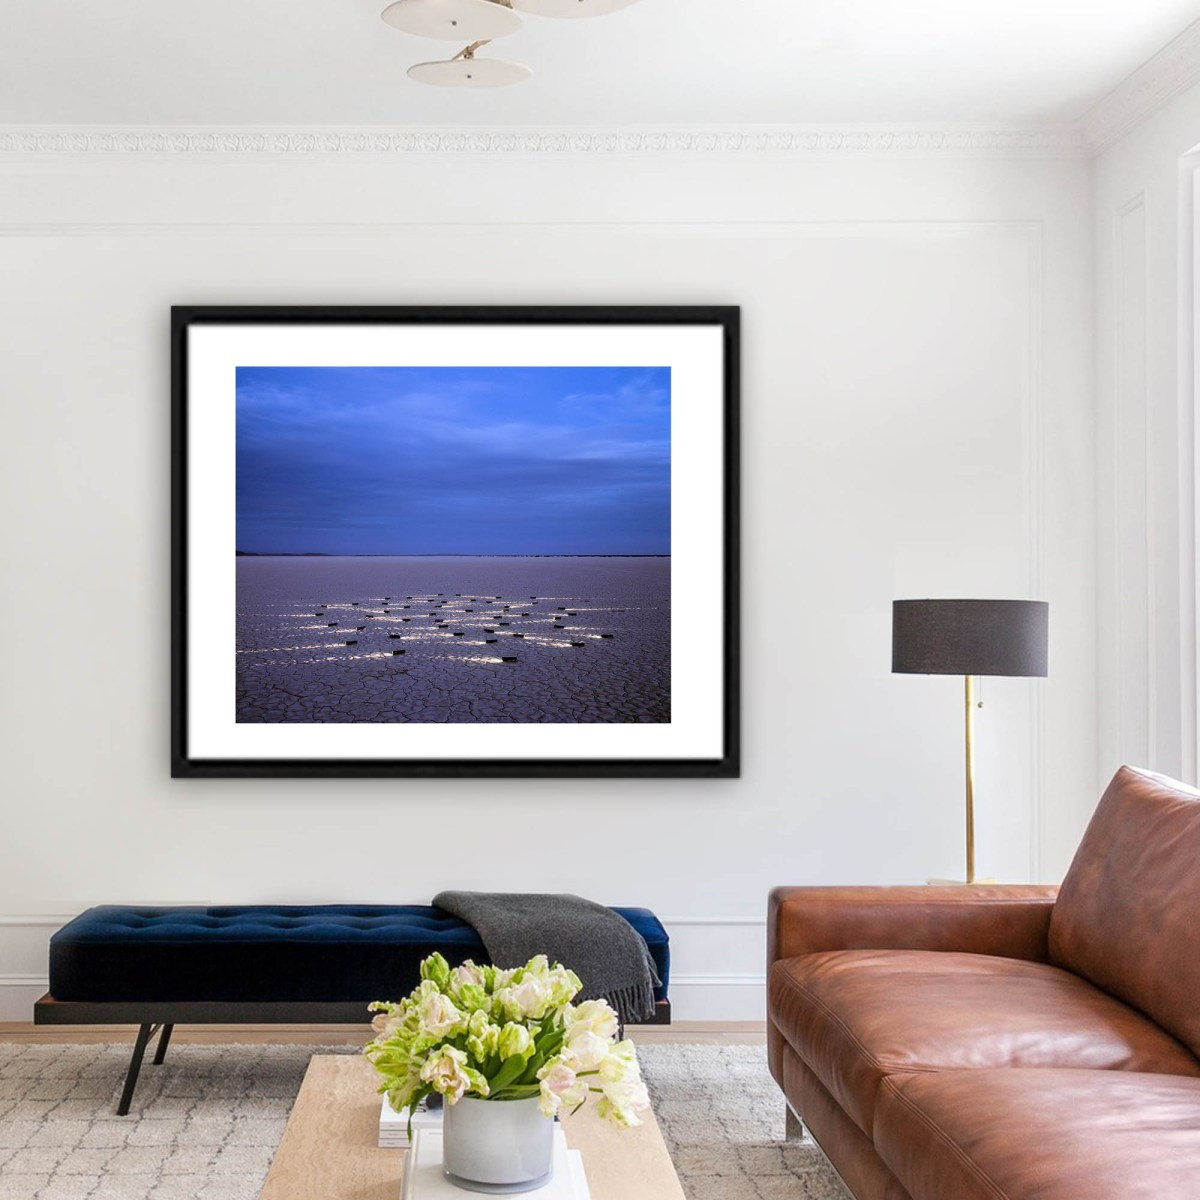 Obra Luciérnagas del fotógrafo Alfredo De Stefano decorando un living